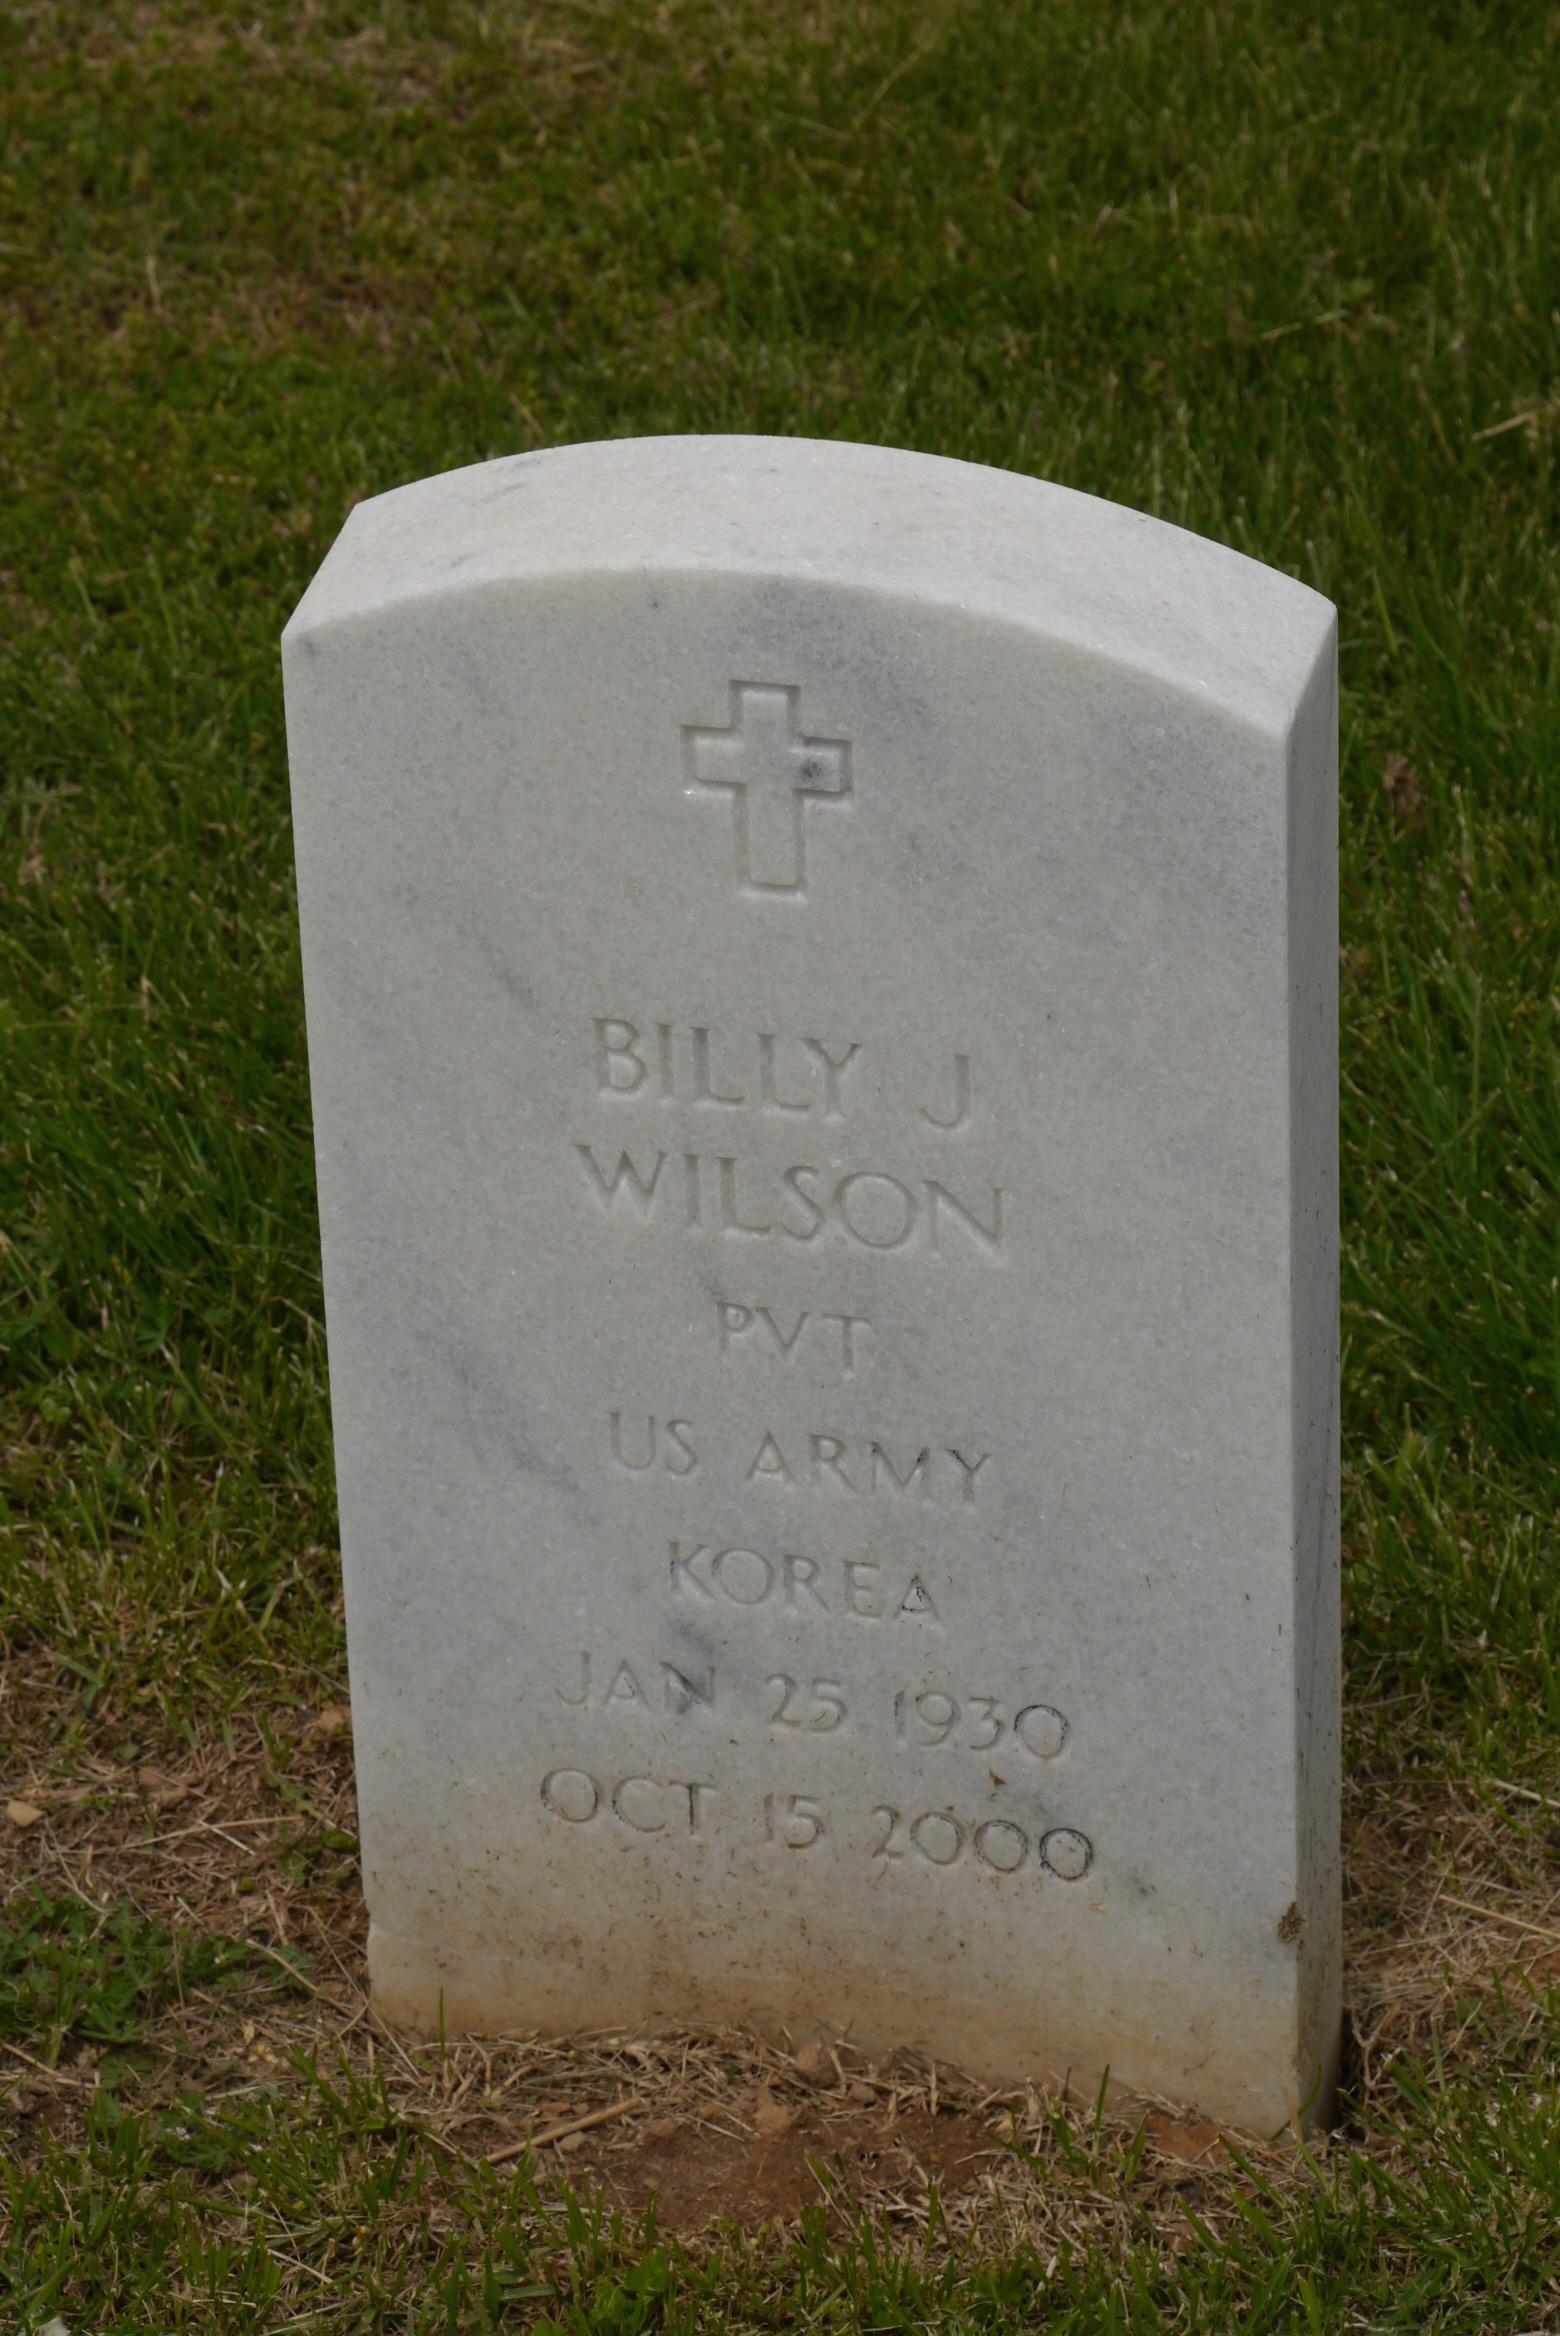 Billy J Wilson